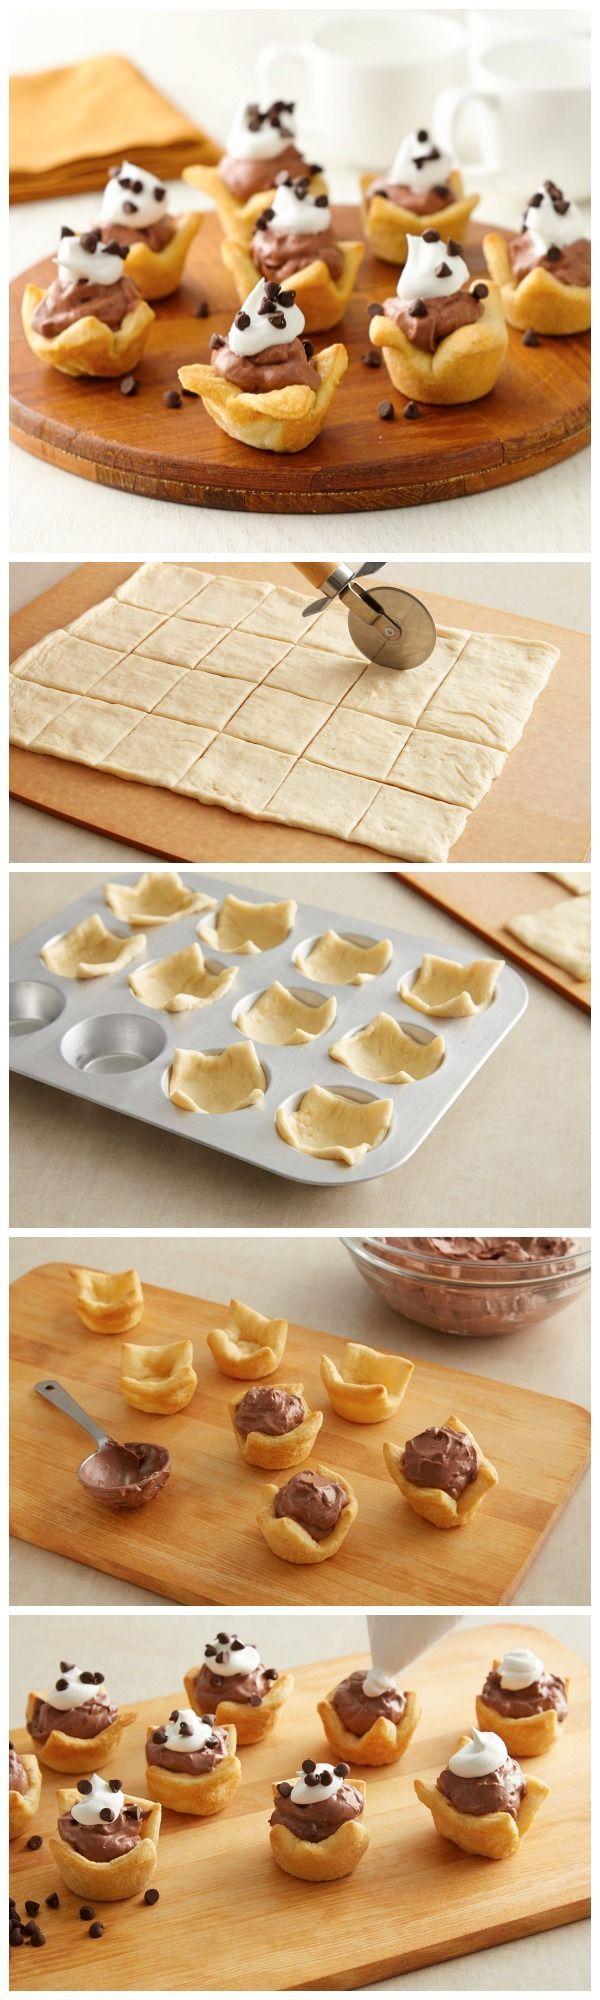 Thanksgiving mini dessert idea: French Silk Crescent Pies from Pillsbury!: